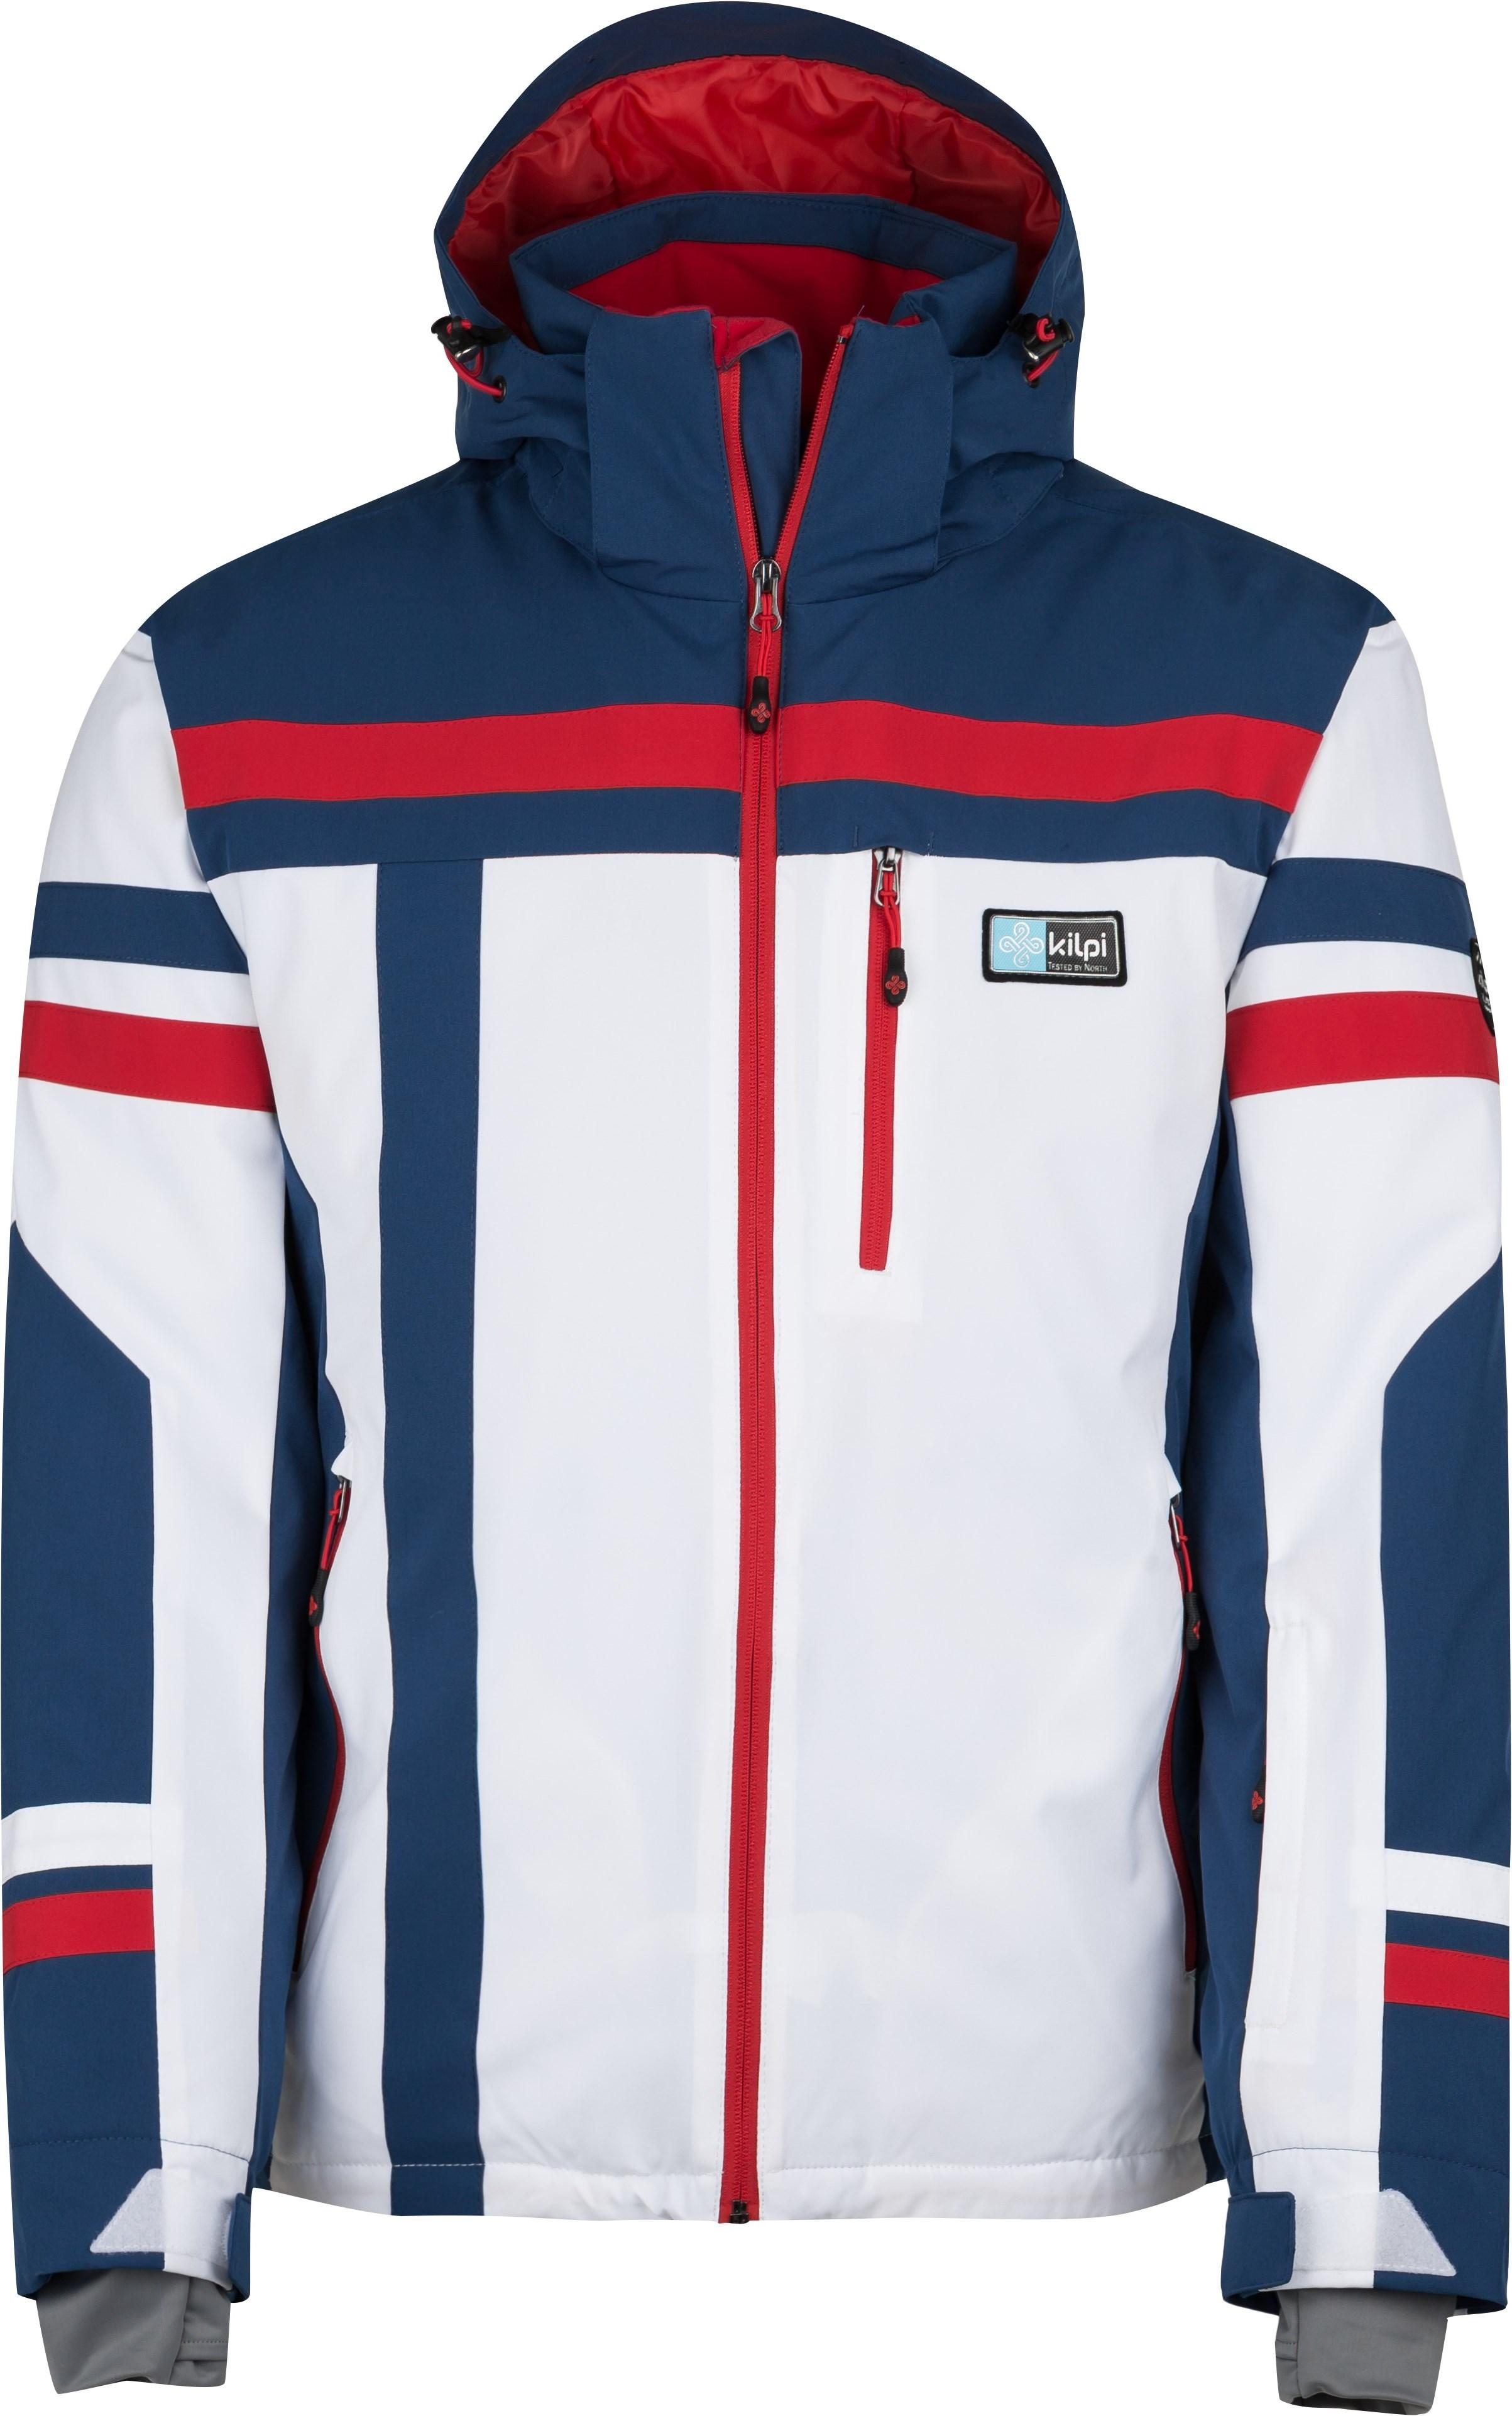 2668aa76b16a Pánska zimná lyžiarská bunda Kilpi TITAN-M bílá (nadmerná velikosť ...